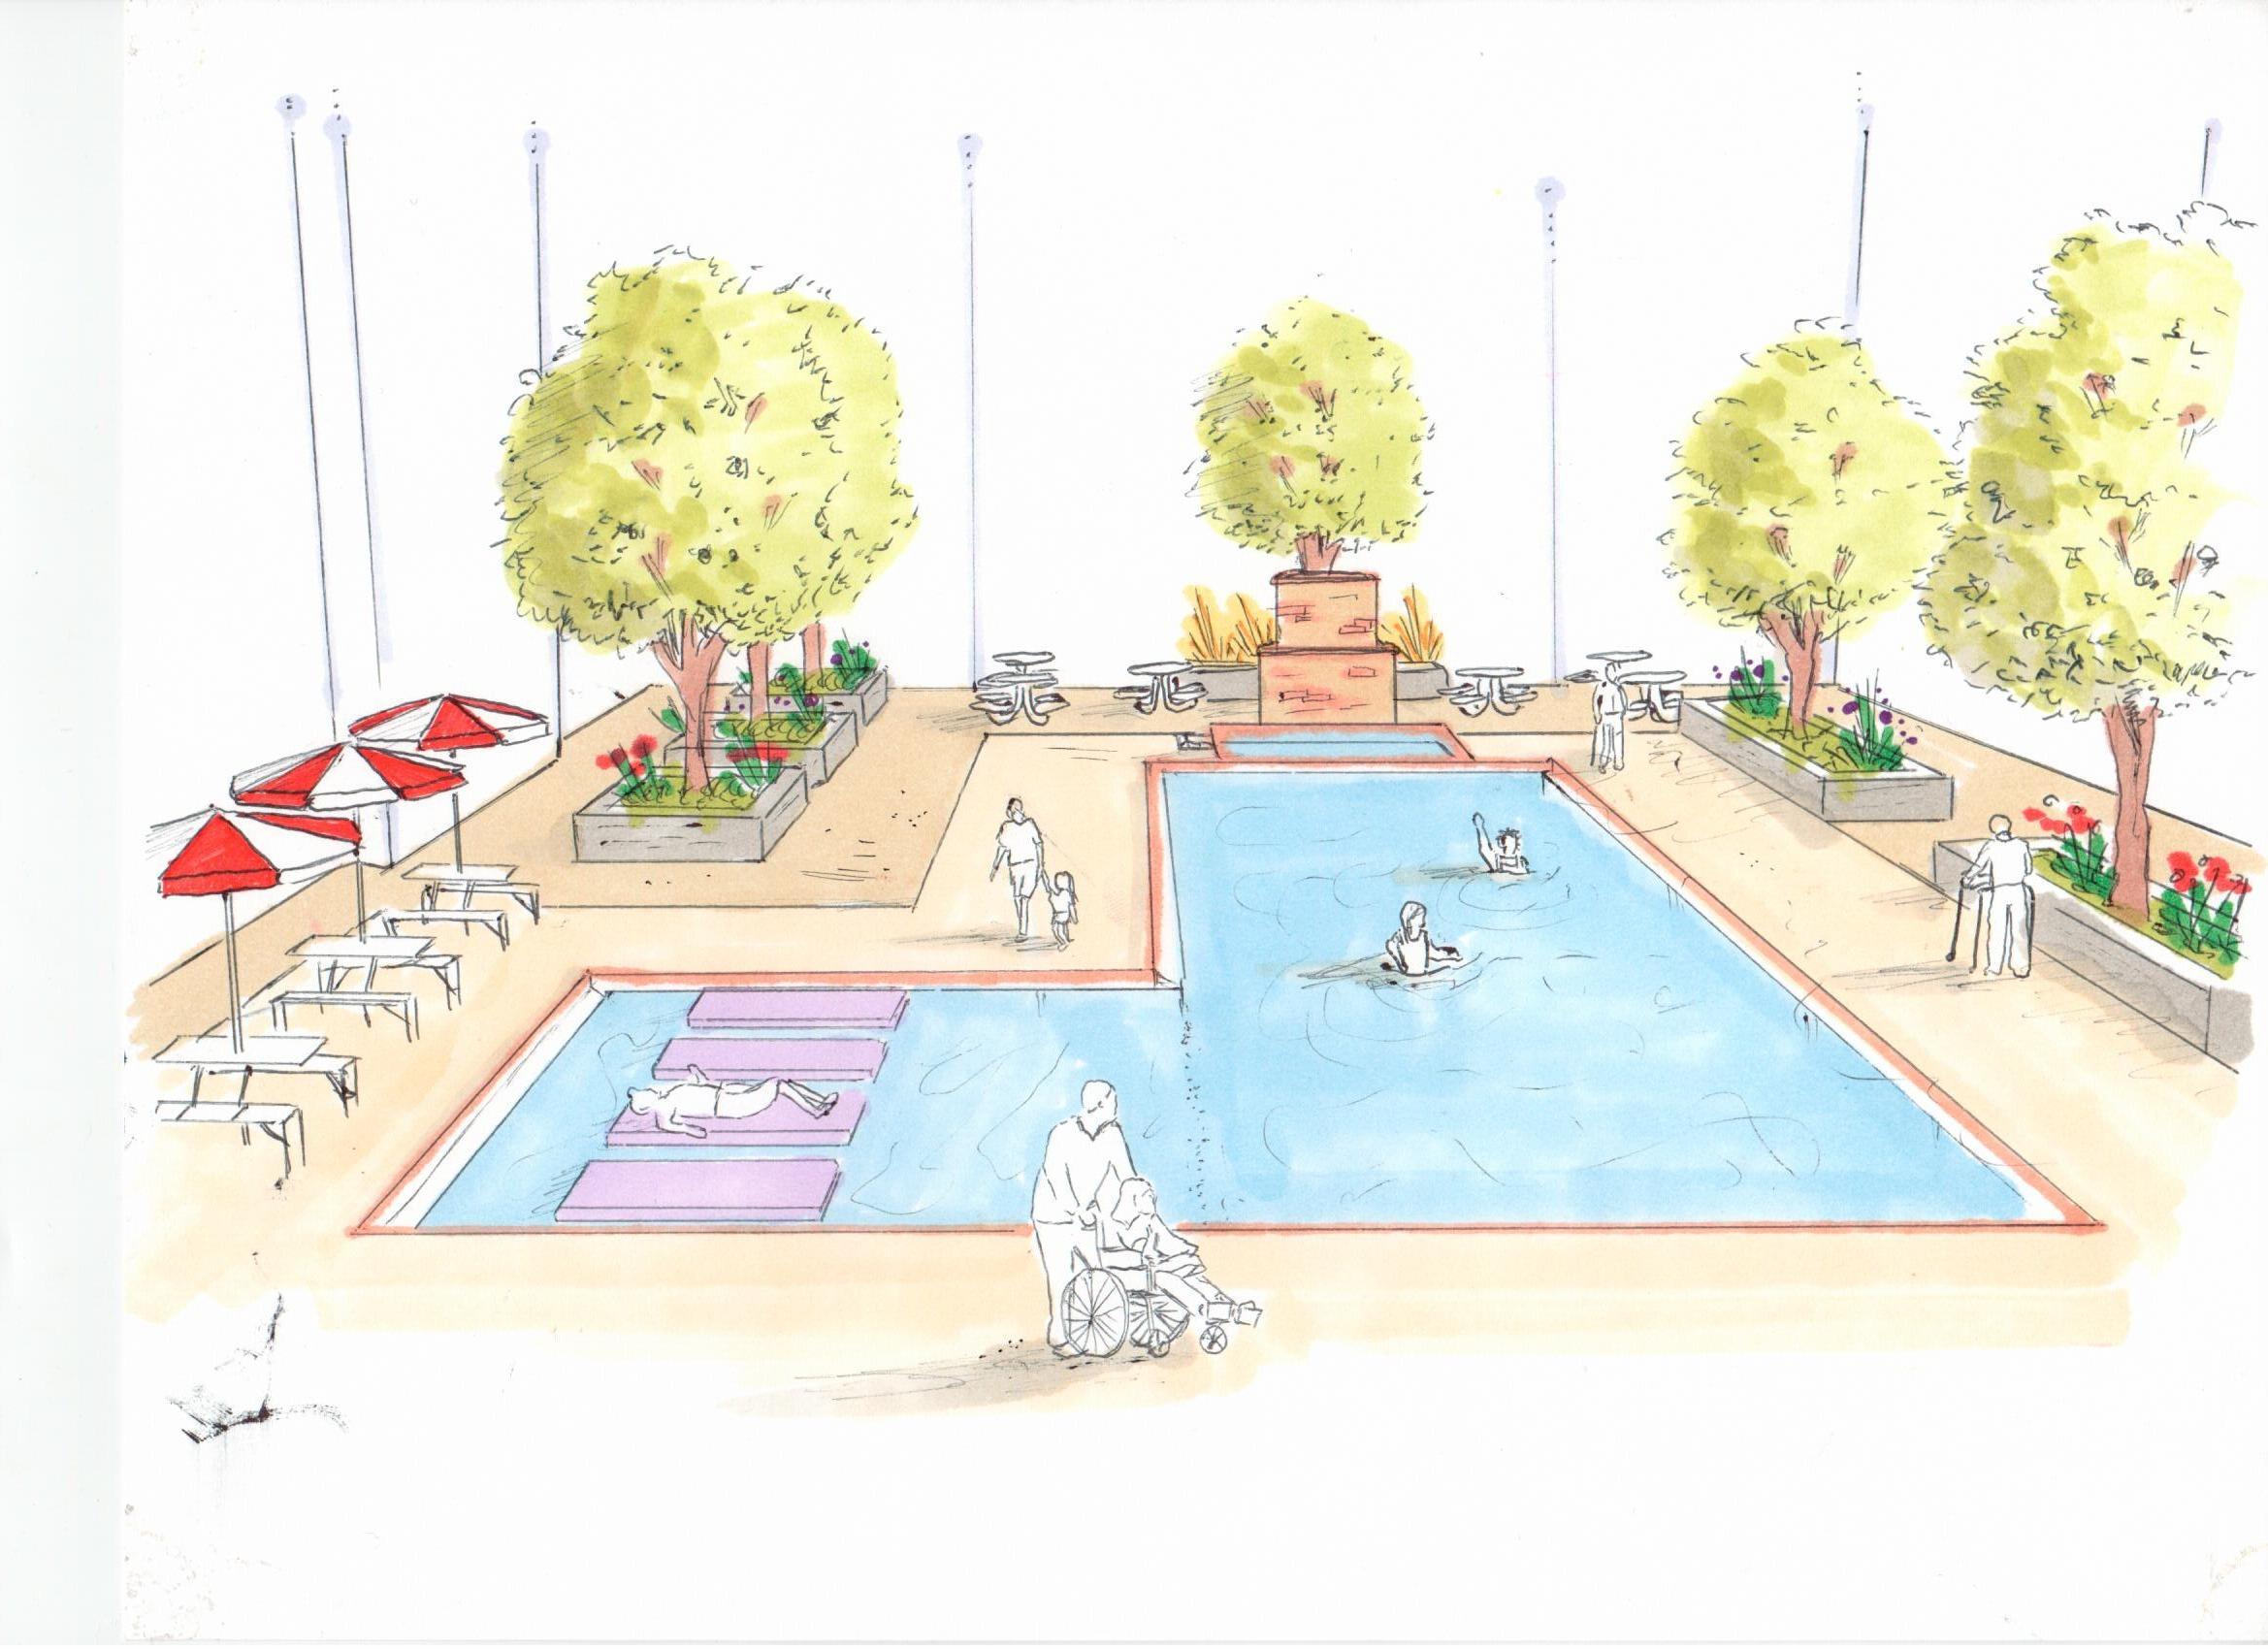 avenida-pool